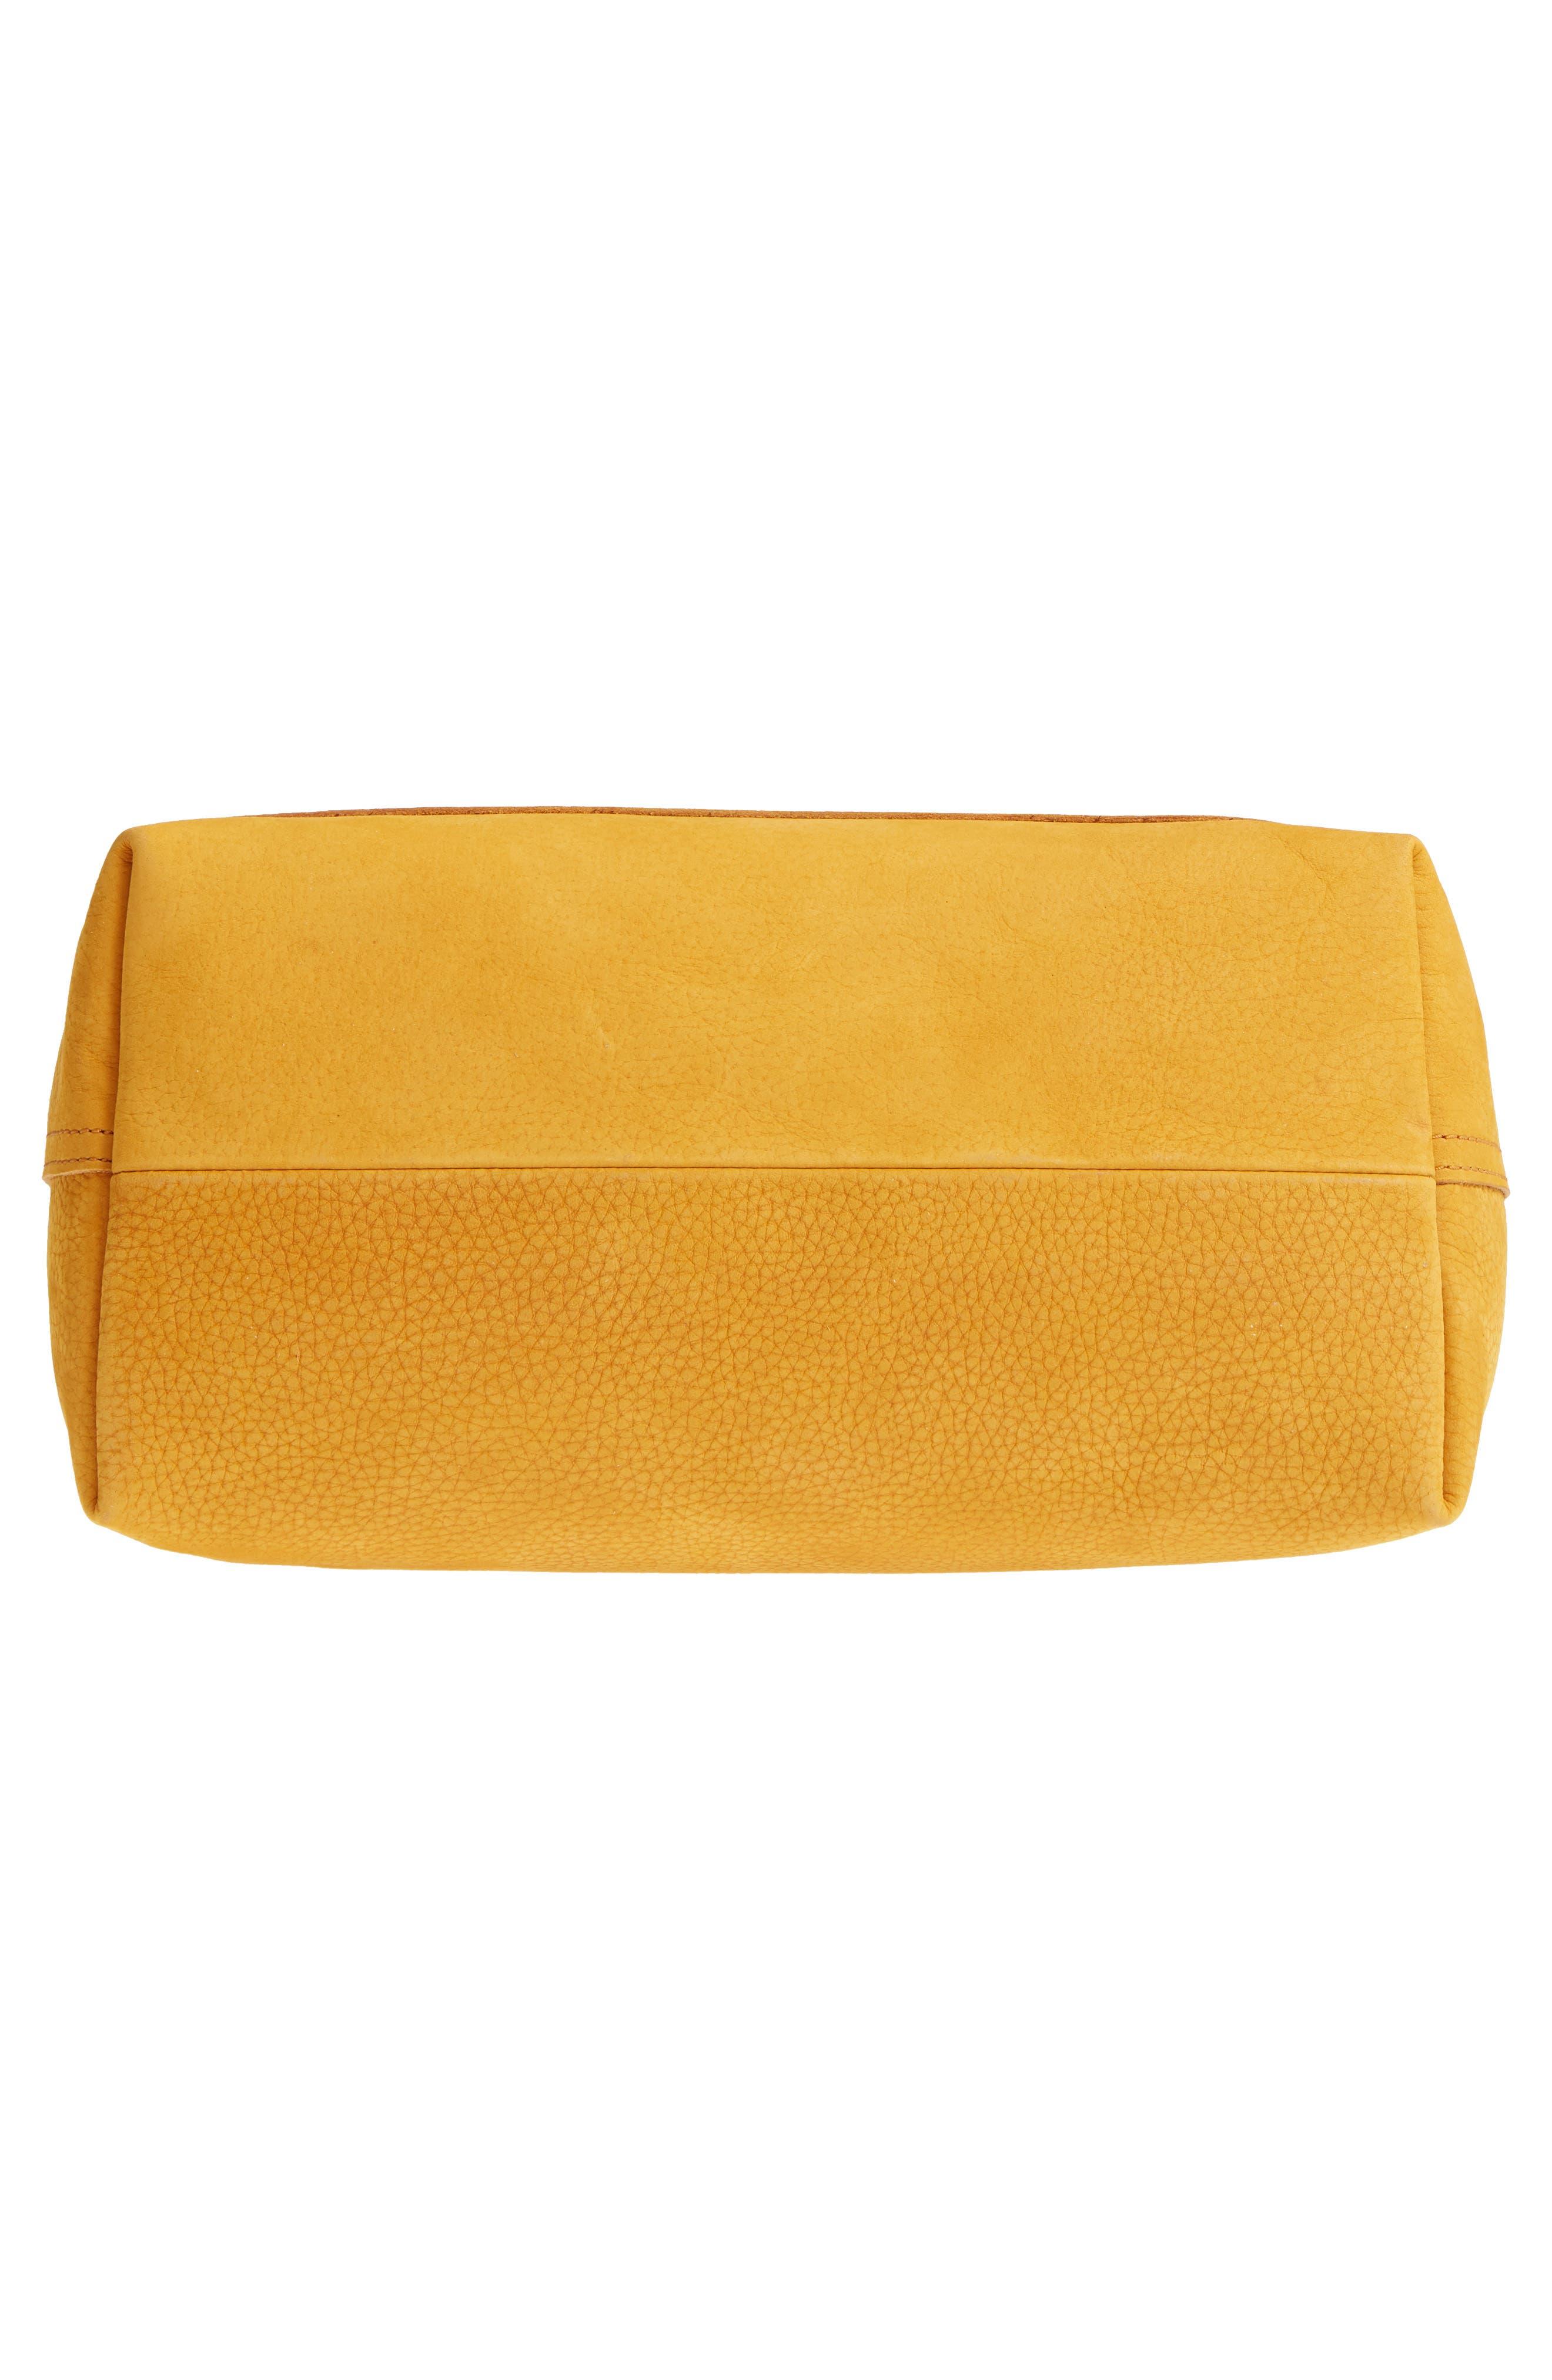 Medium Leather Transport Tote,                             Alternate thumbnail 6, color,                             Celestial Gold